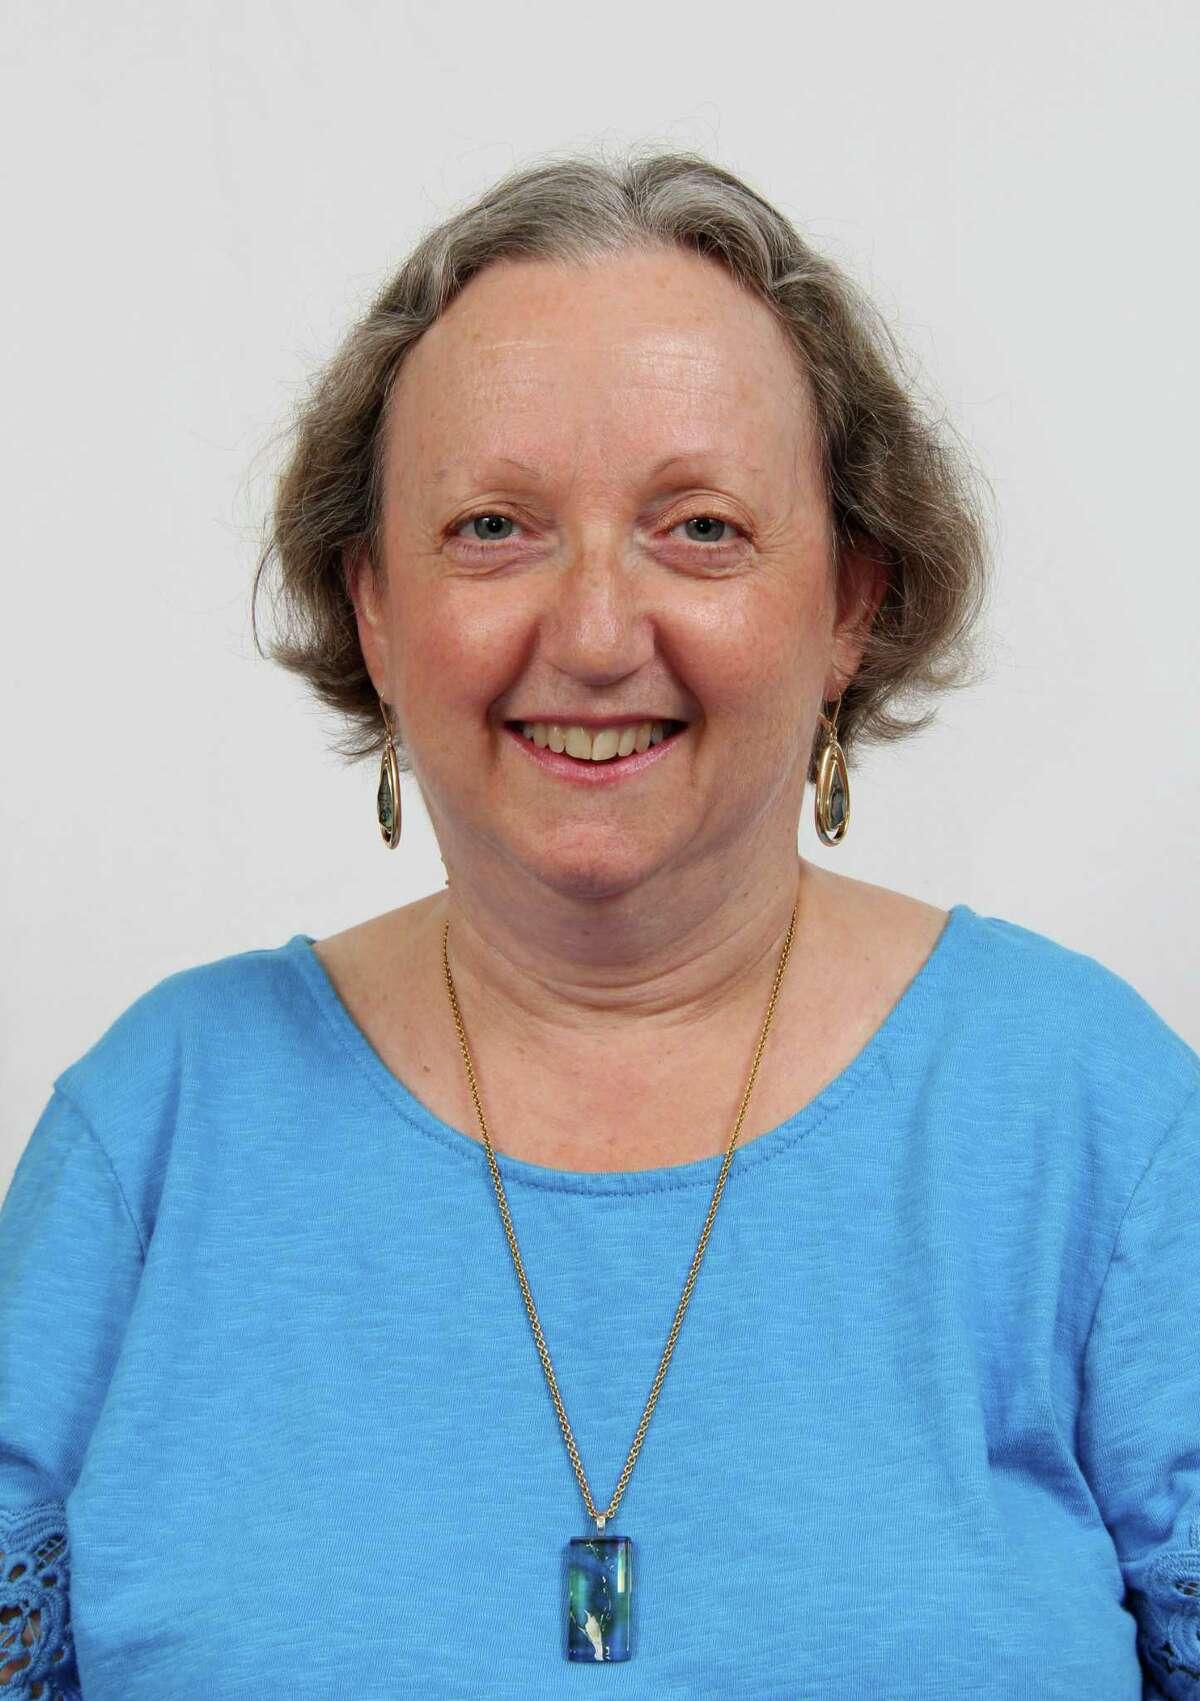 Cathy Schaefer Bethel Democrat Board of Education candidate